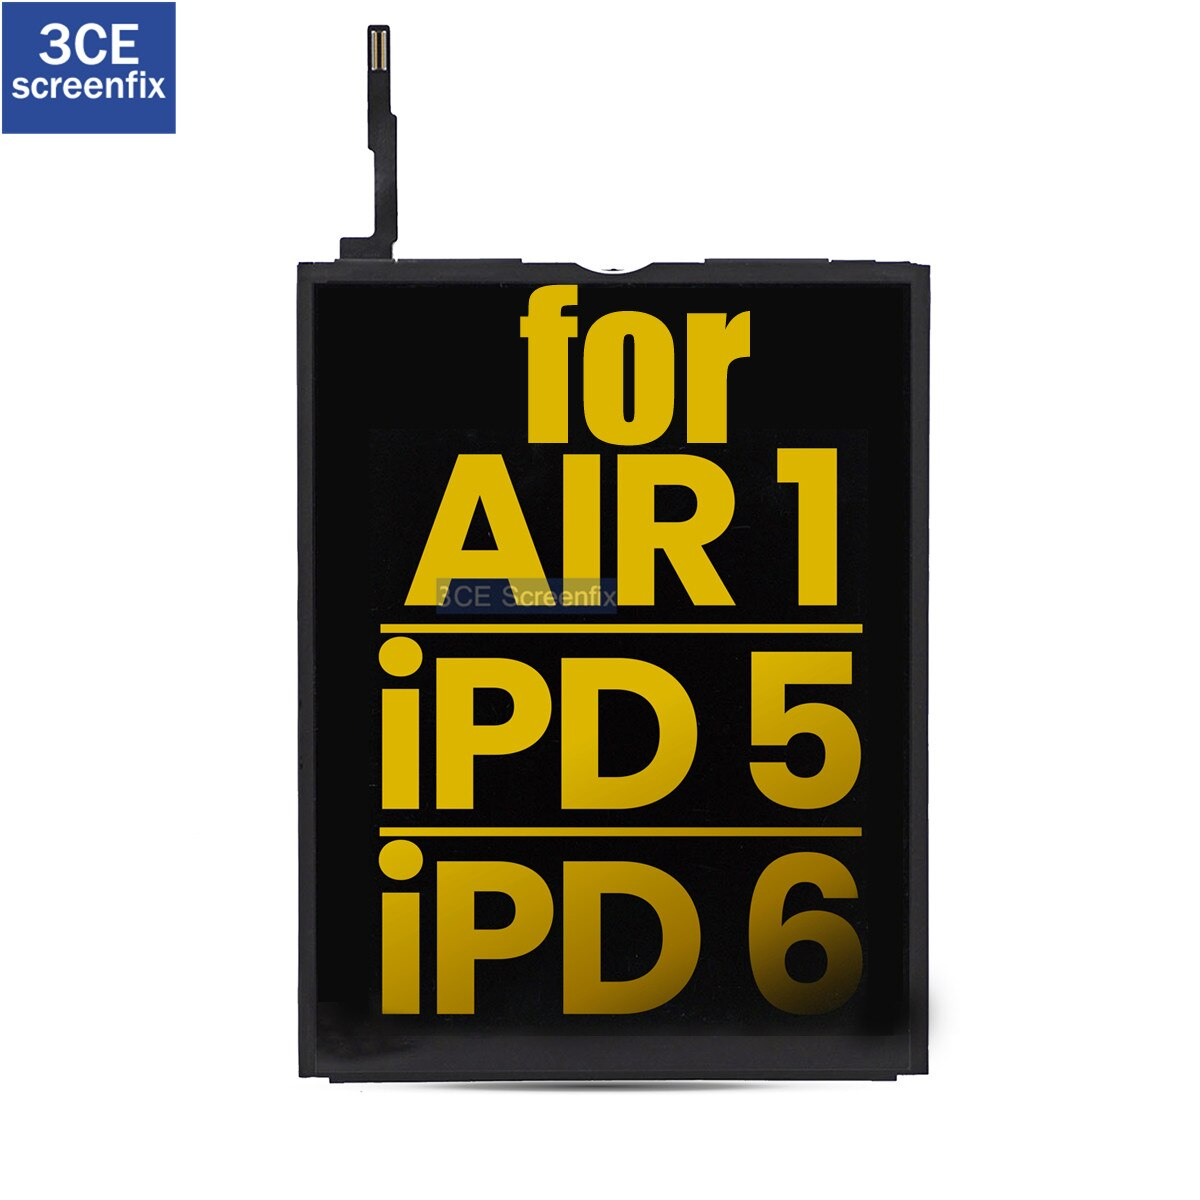 5pcs-original-lcd-display-for-ipad-air-1-ipad-5-2017-6-2018-a1474-a1475-a1476-a1822-a1823-lcd-display